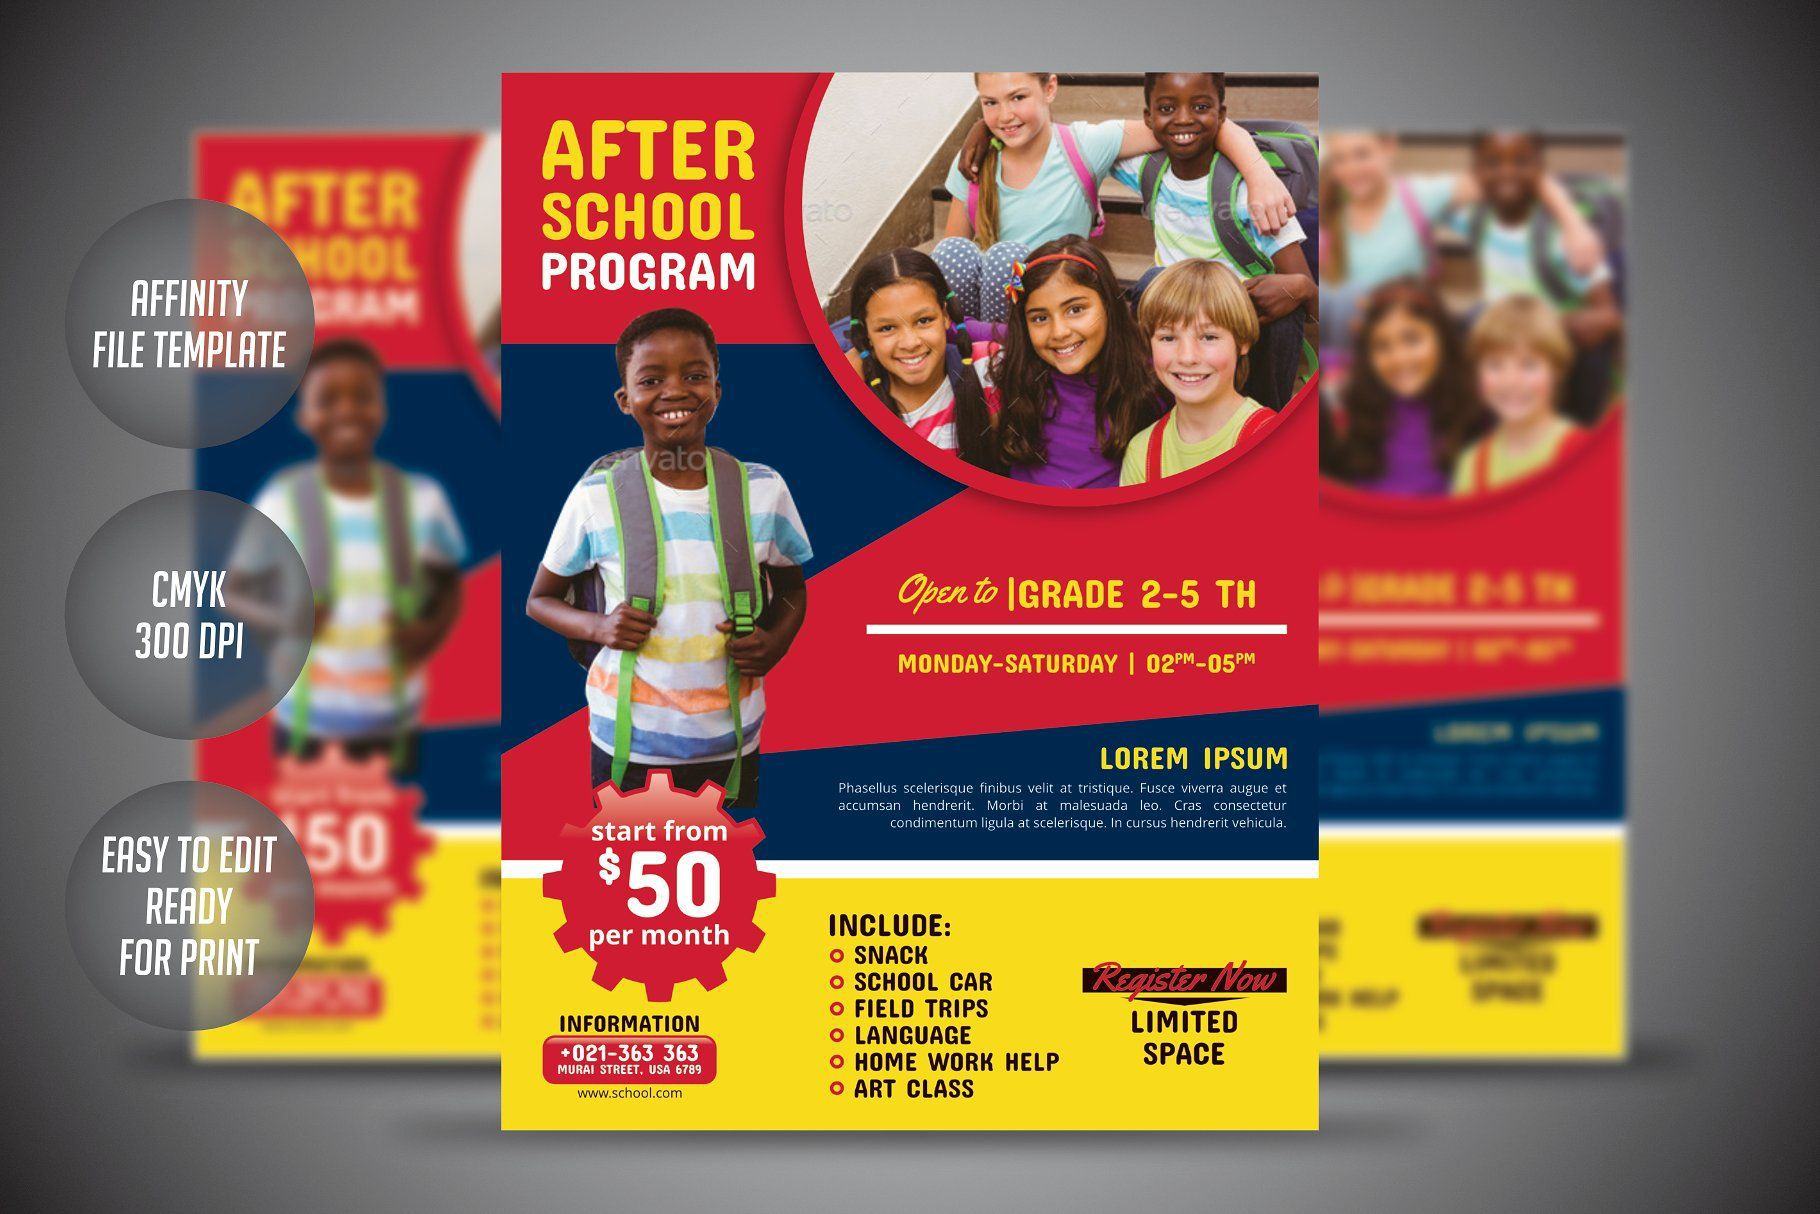 003 Singular Free After School Program Flyer Template Concept Full